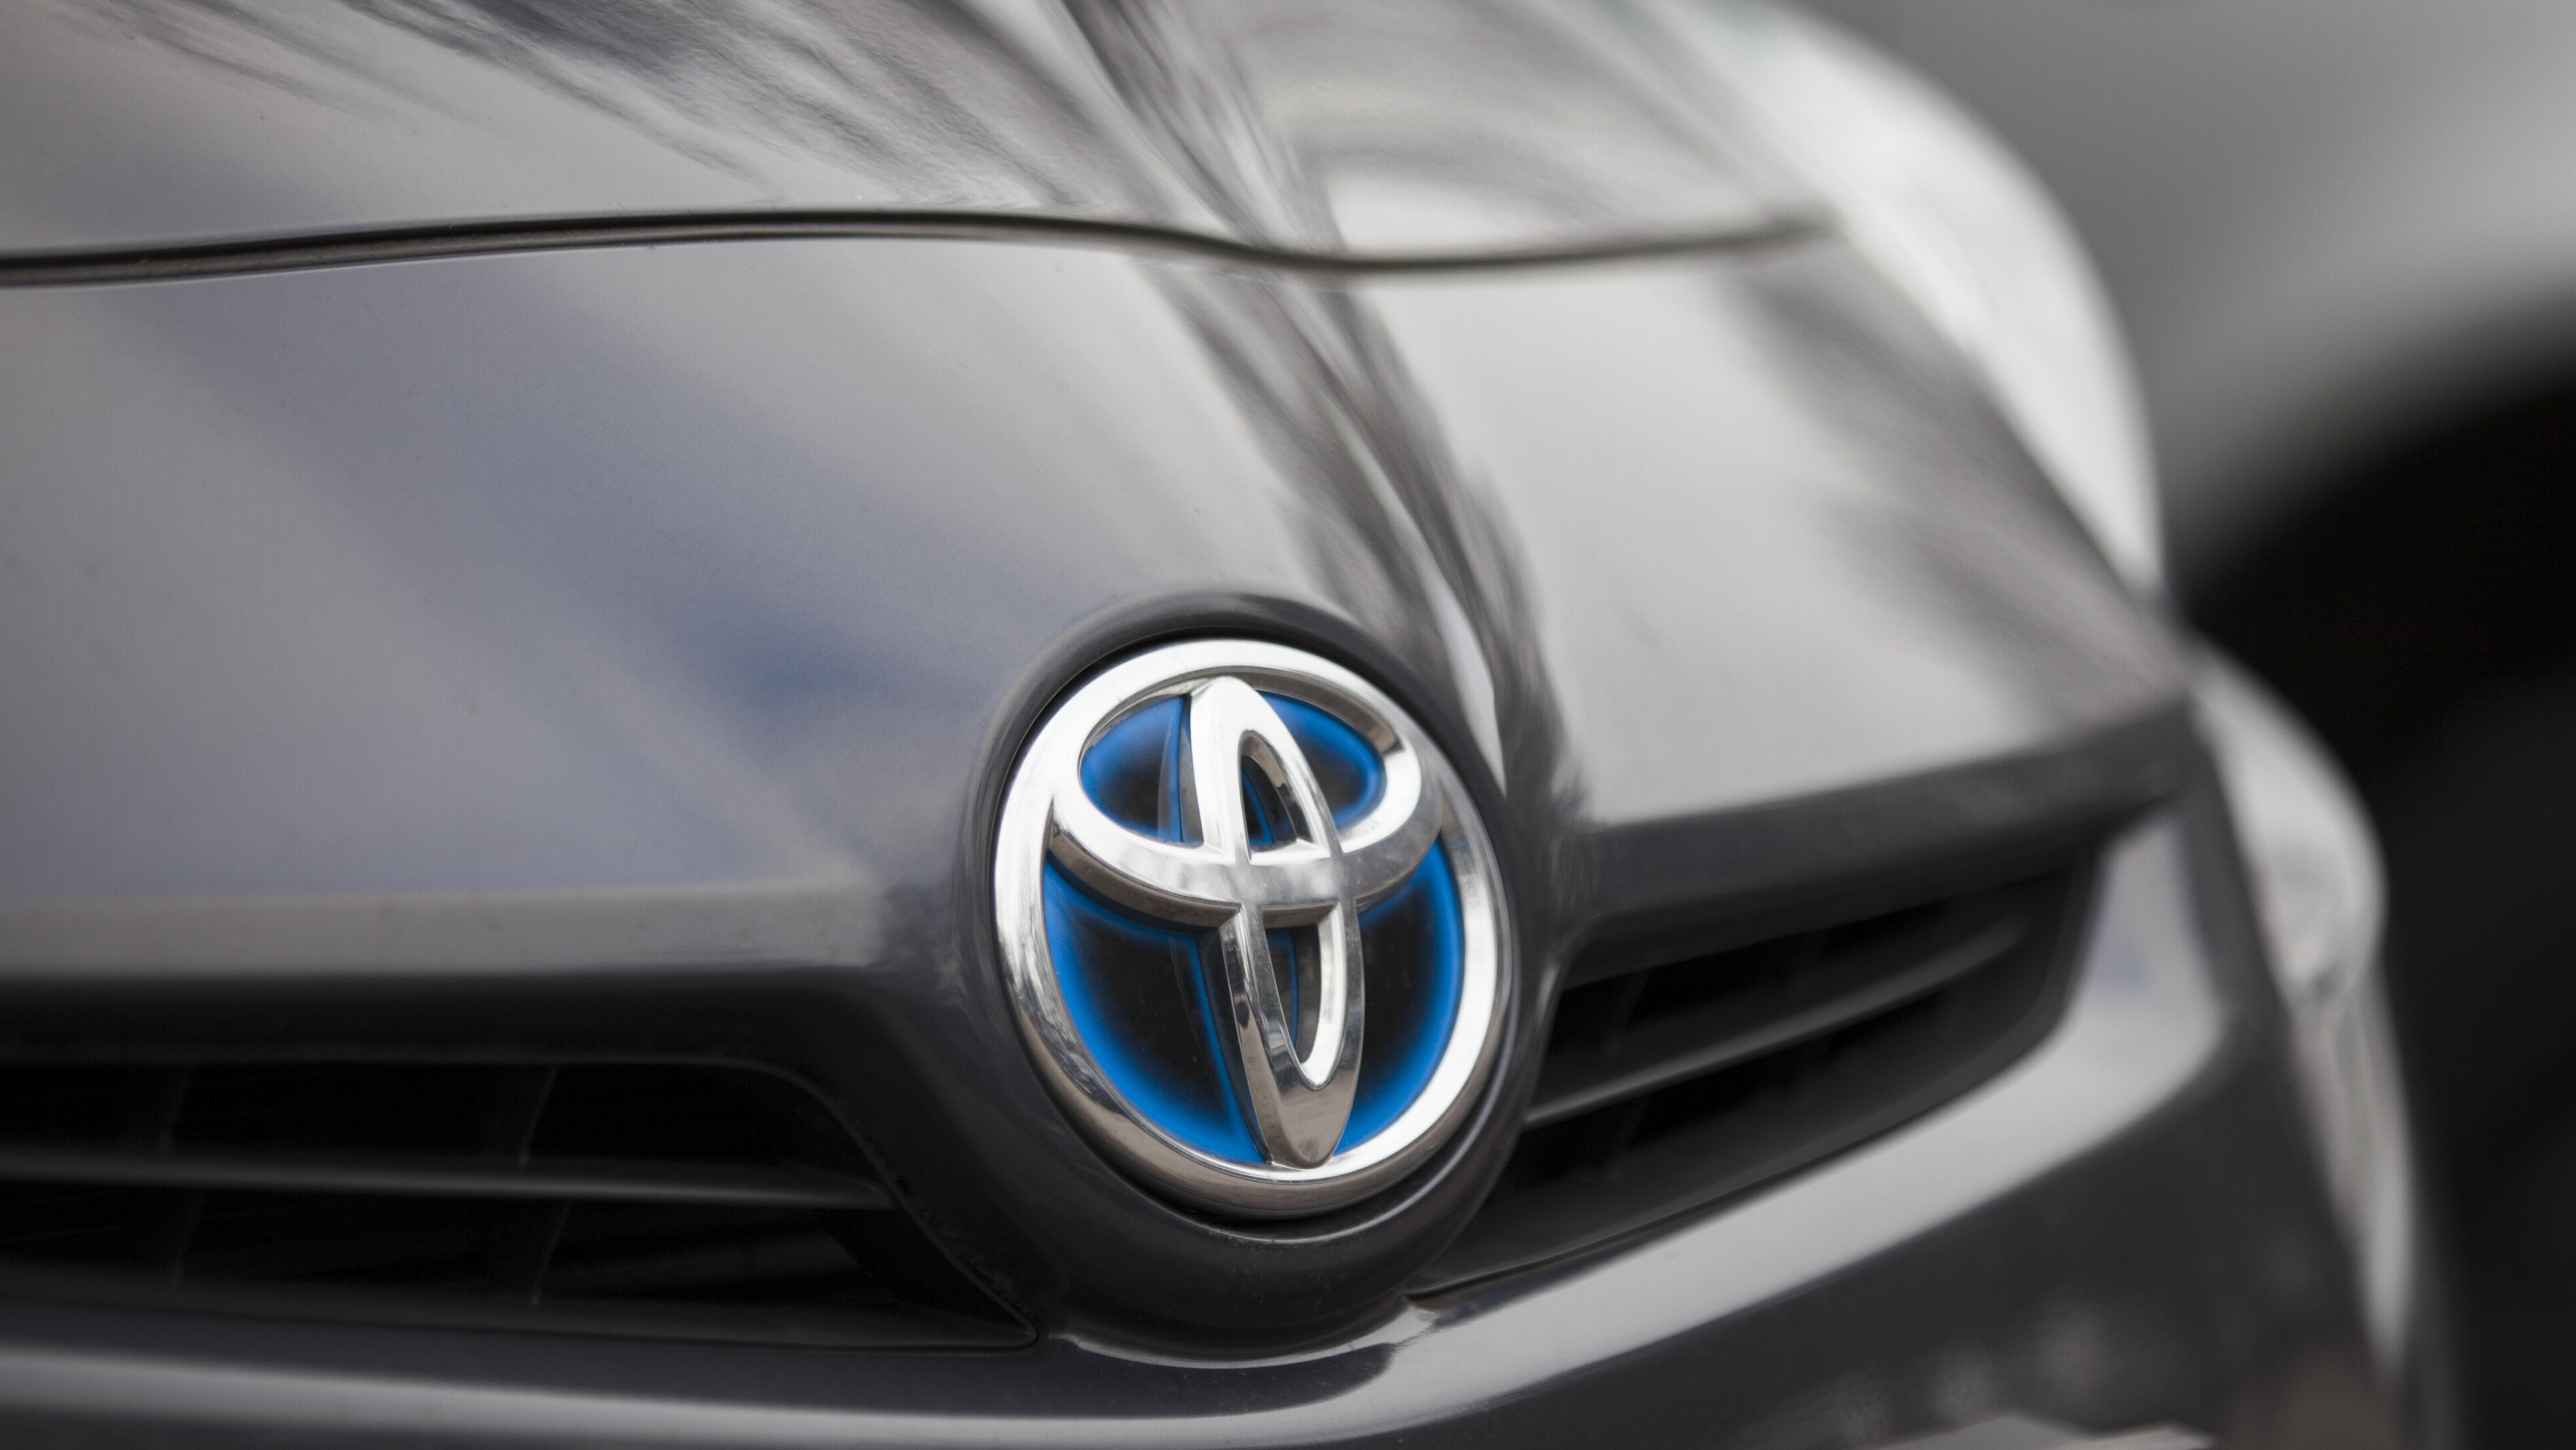 Toyota-Logo an einer Motorhaube